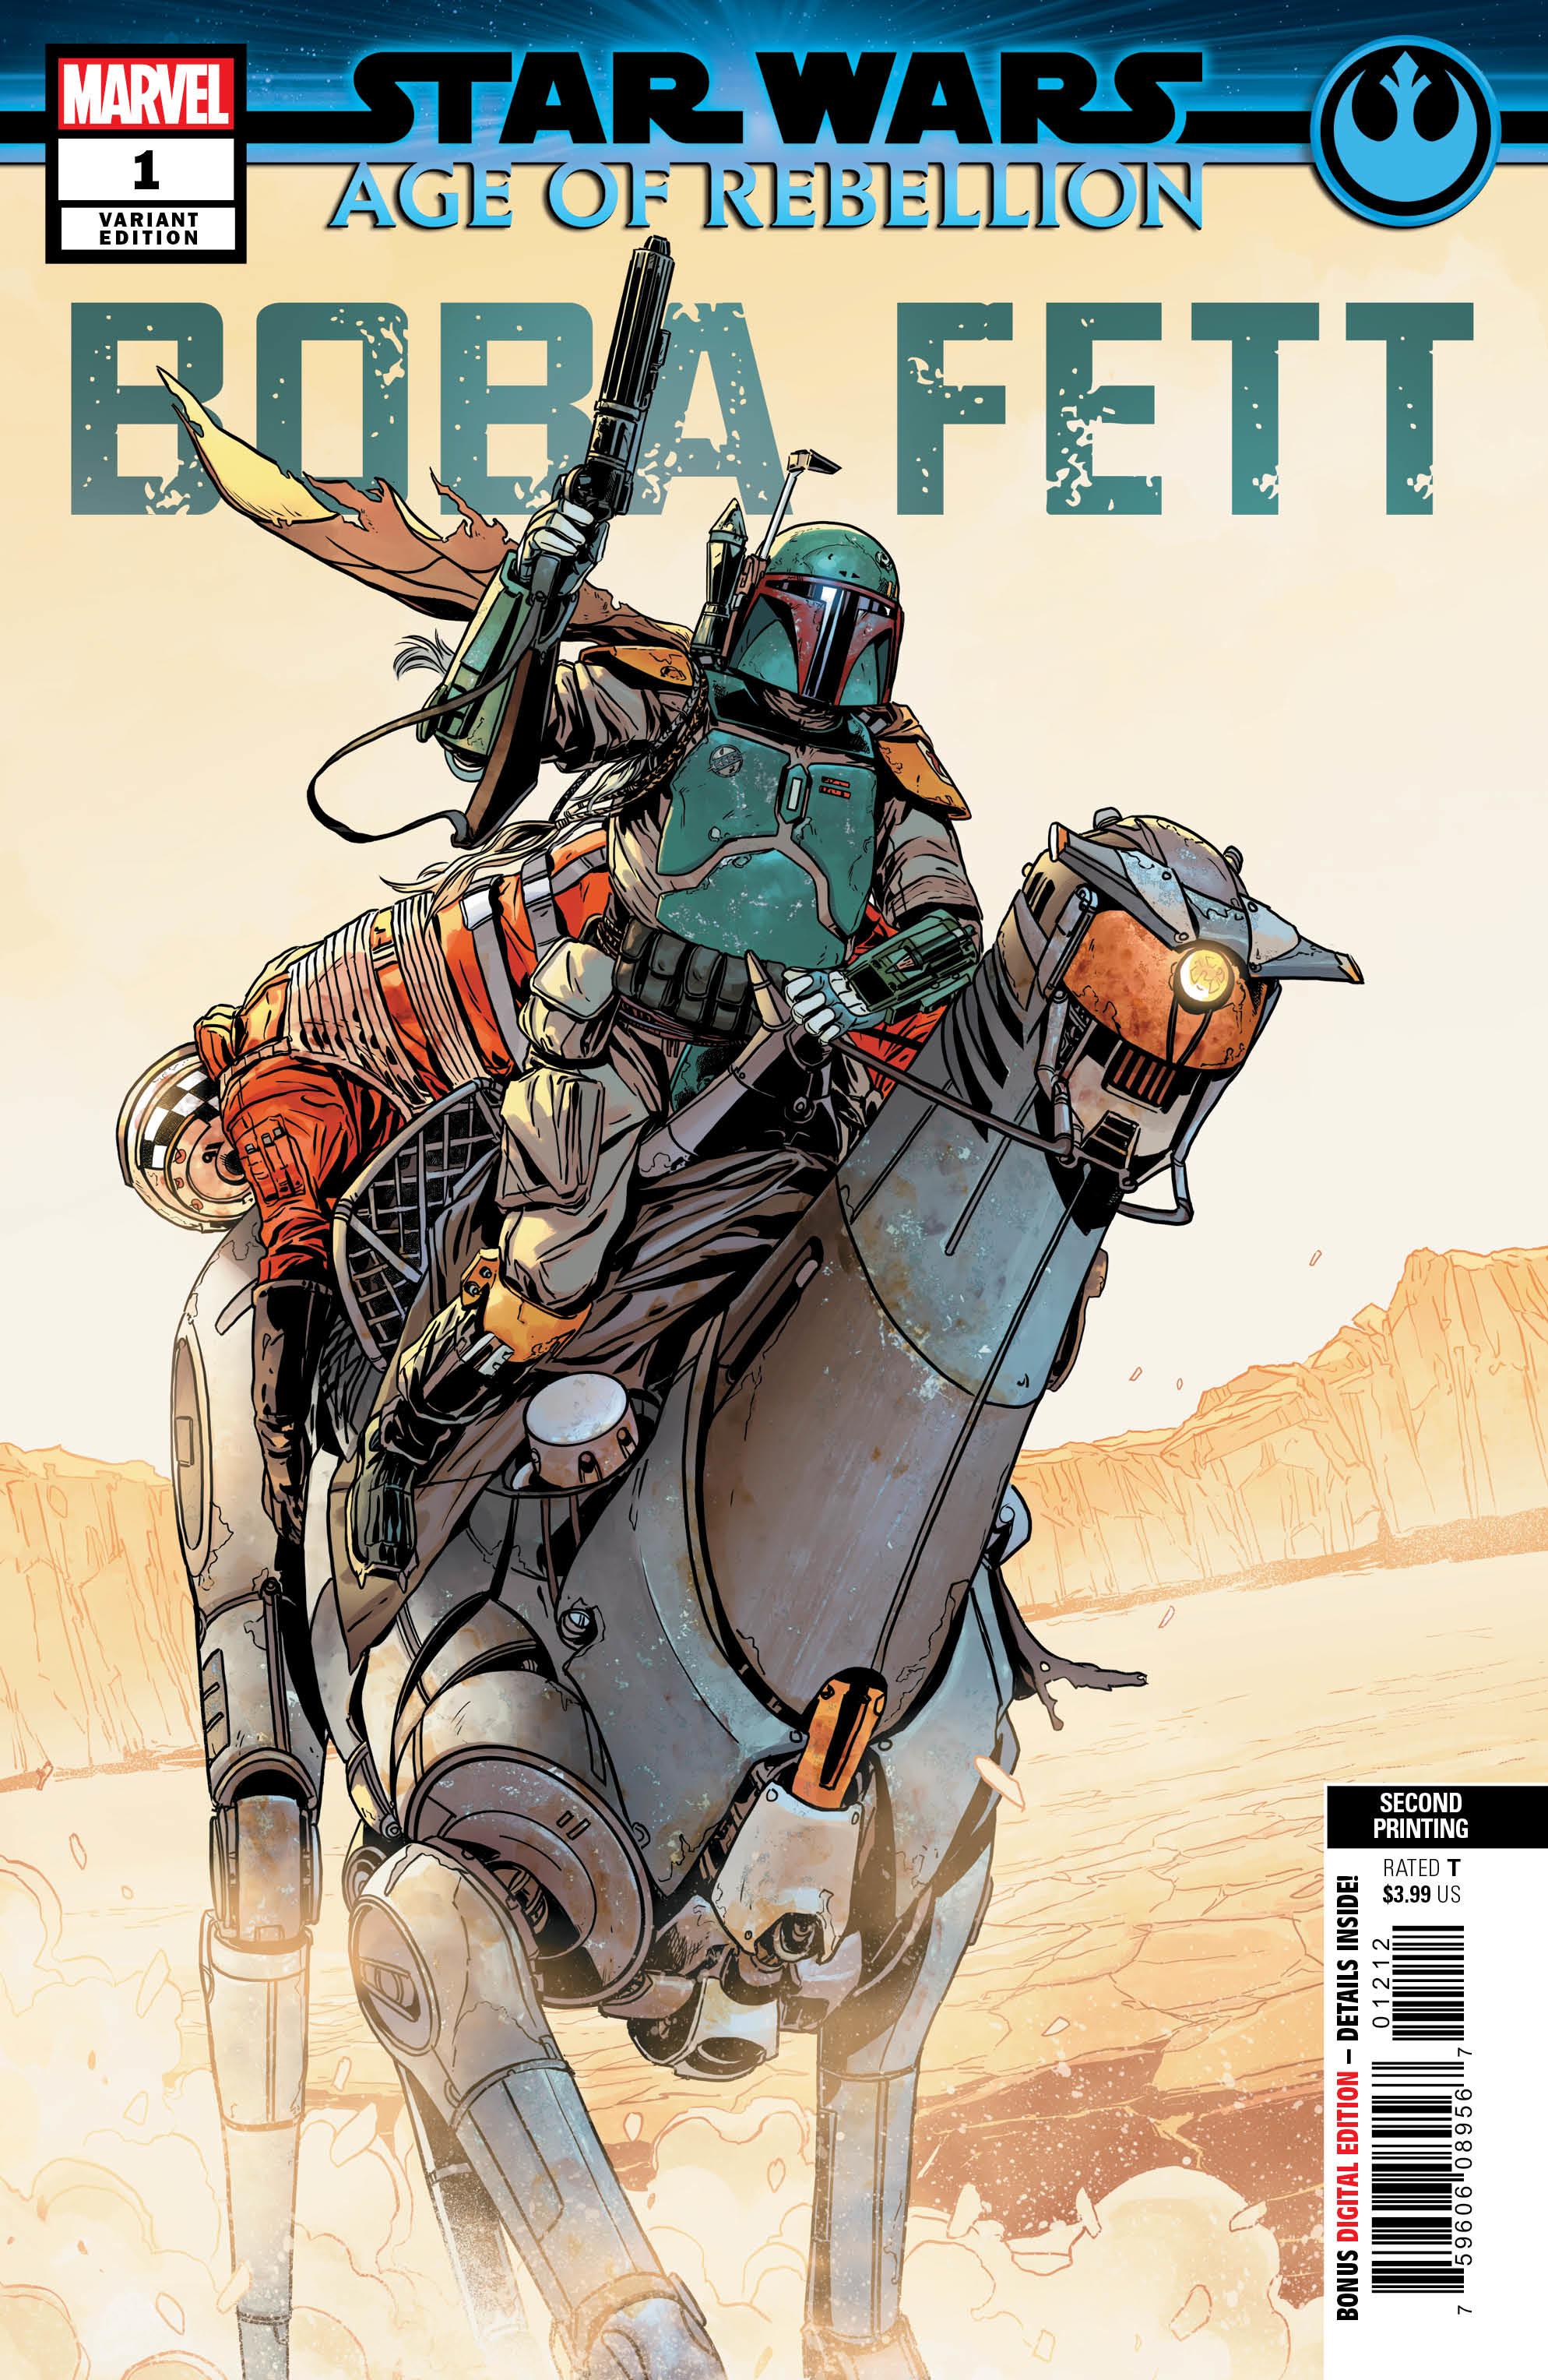 Age of Rebellion: Boba Fett #1 (2nd Printing) (12.06.2019)